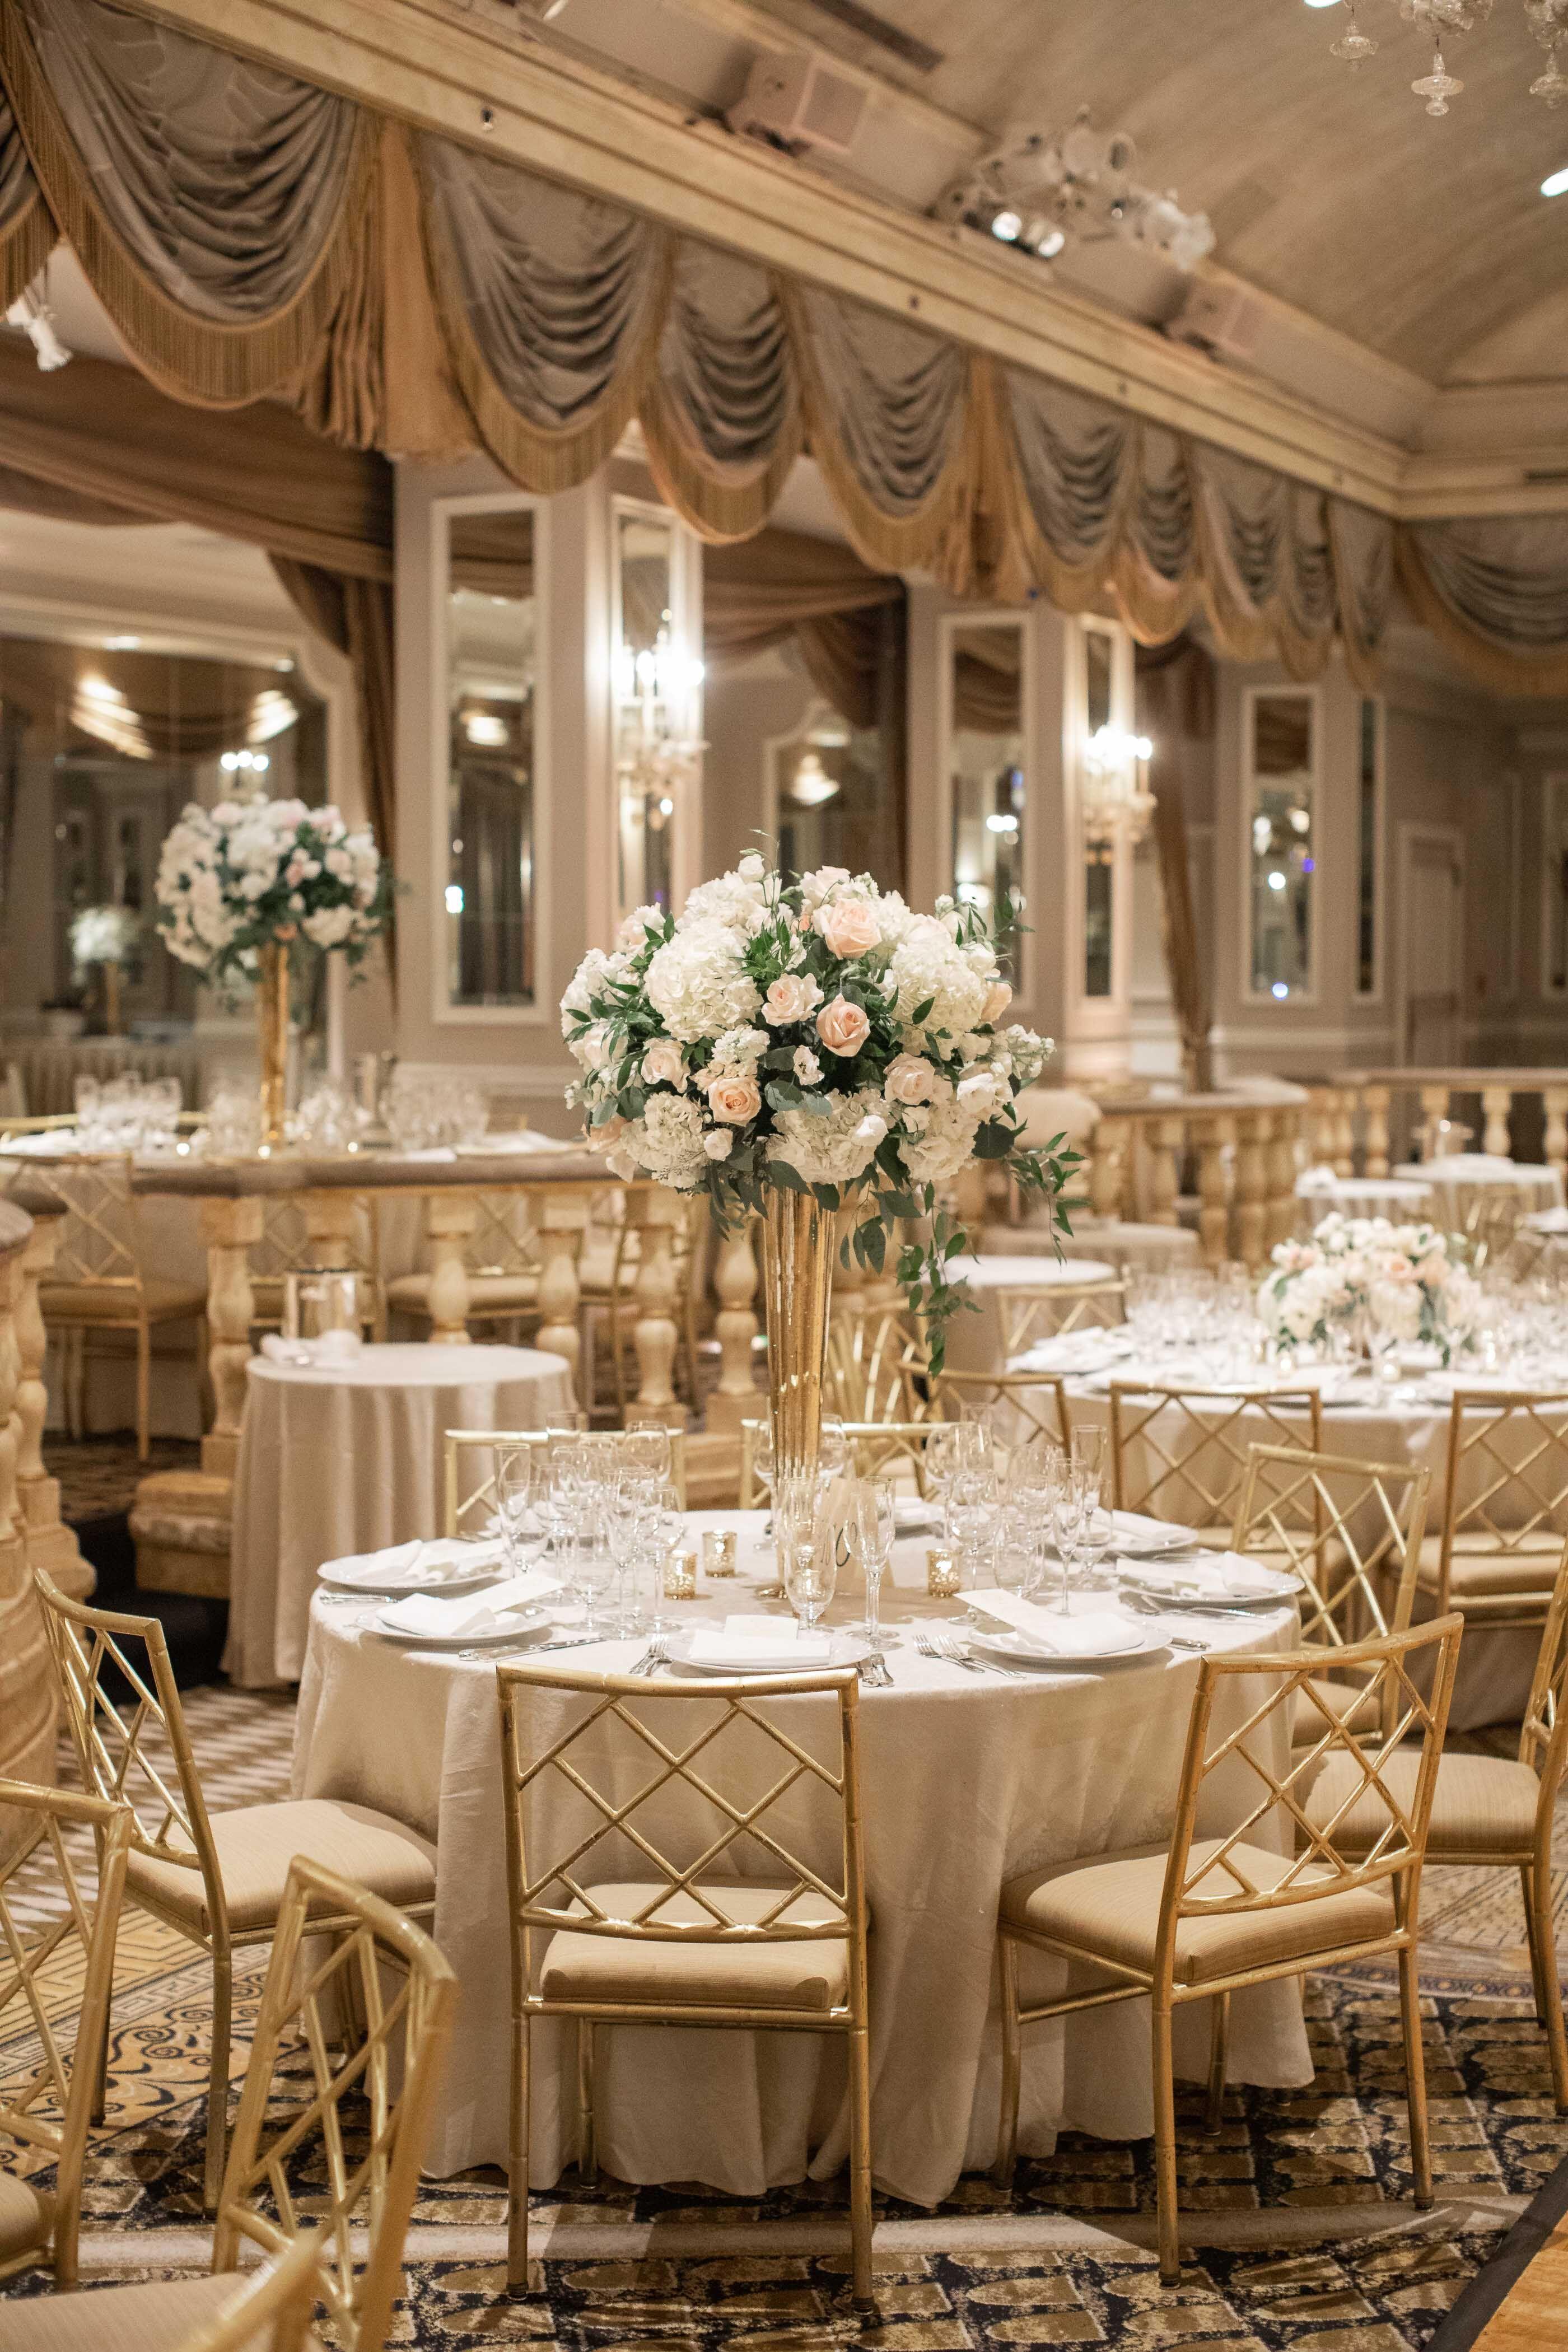 Elegant NYC ballroom wedding with towering floral ...